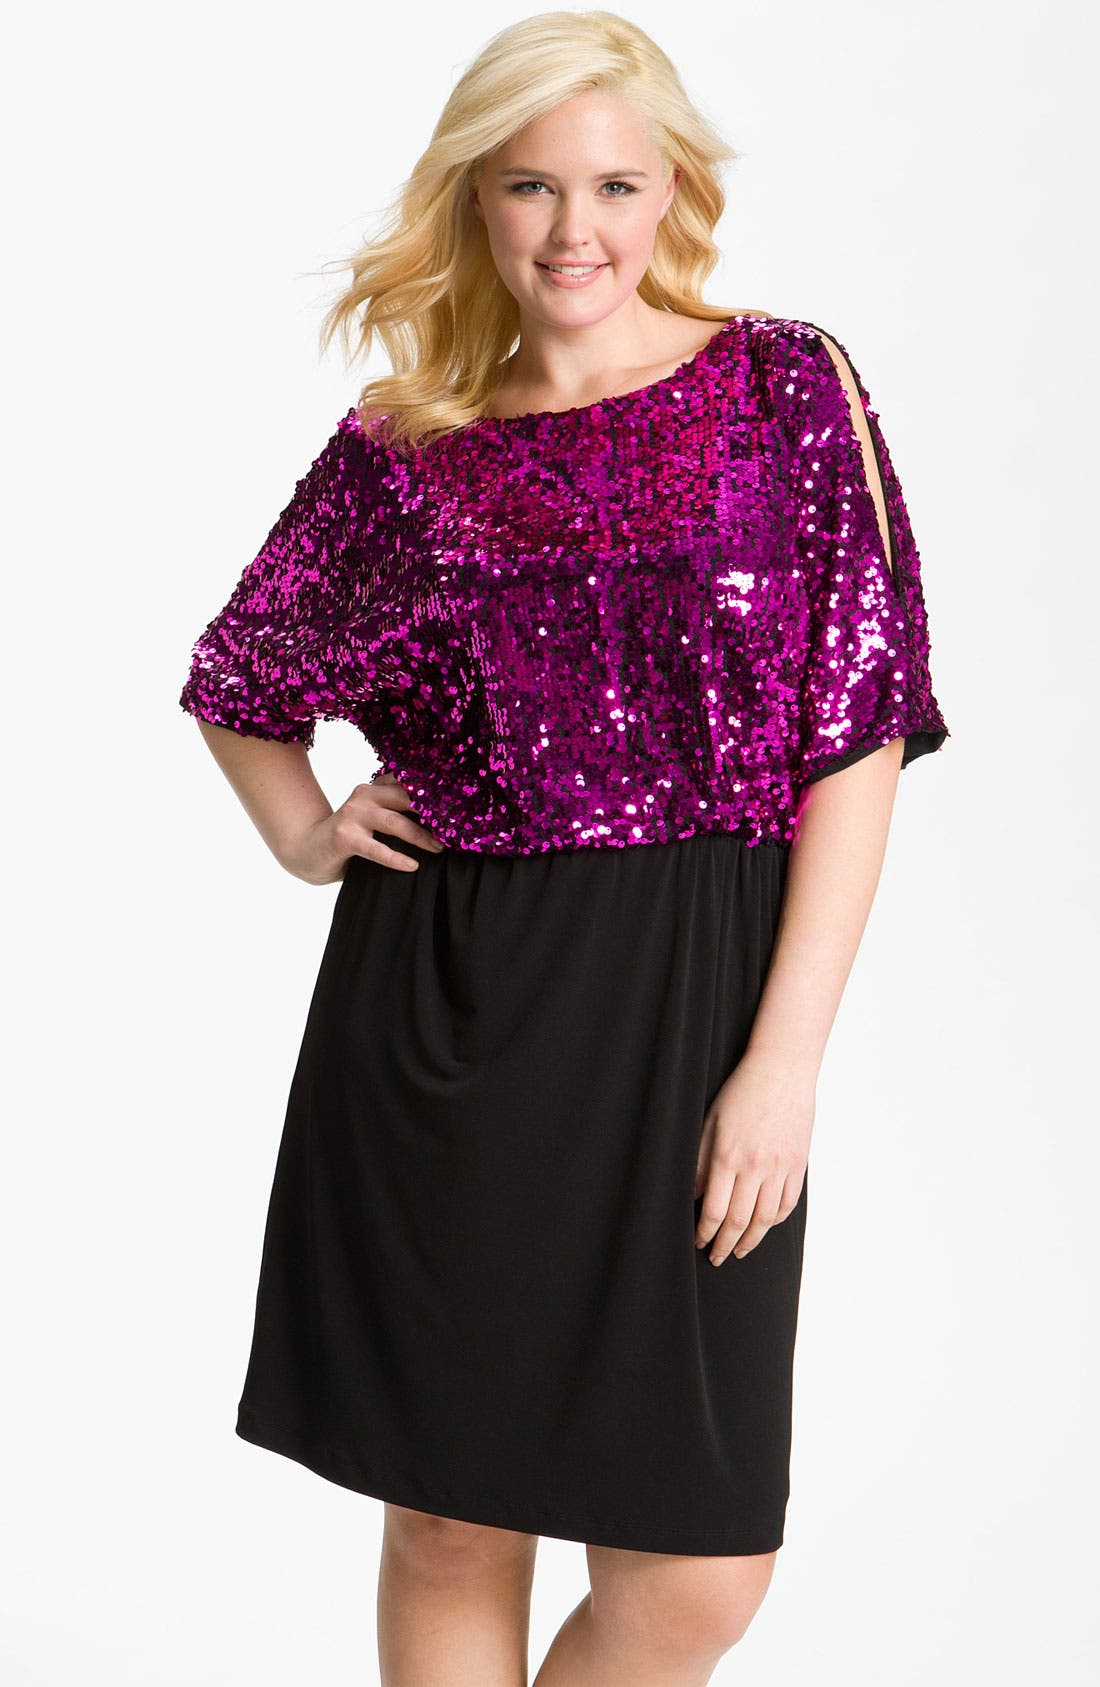 Alternate Image 1 Selected - Donna Ricco Sequin Blouson Dress (Plus)